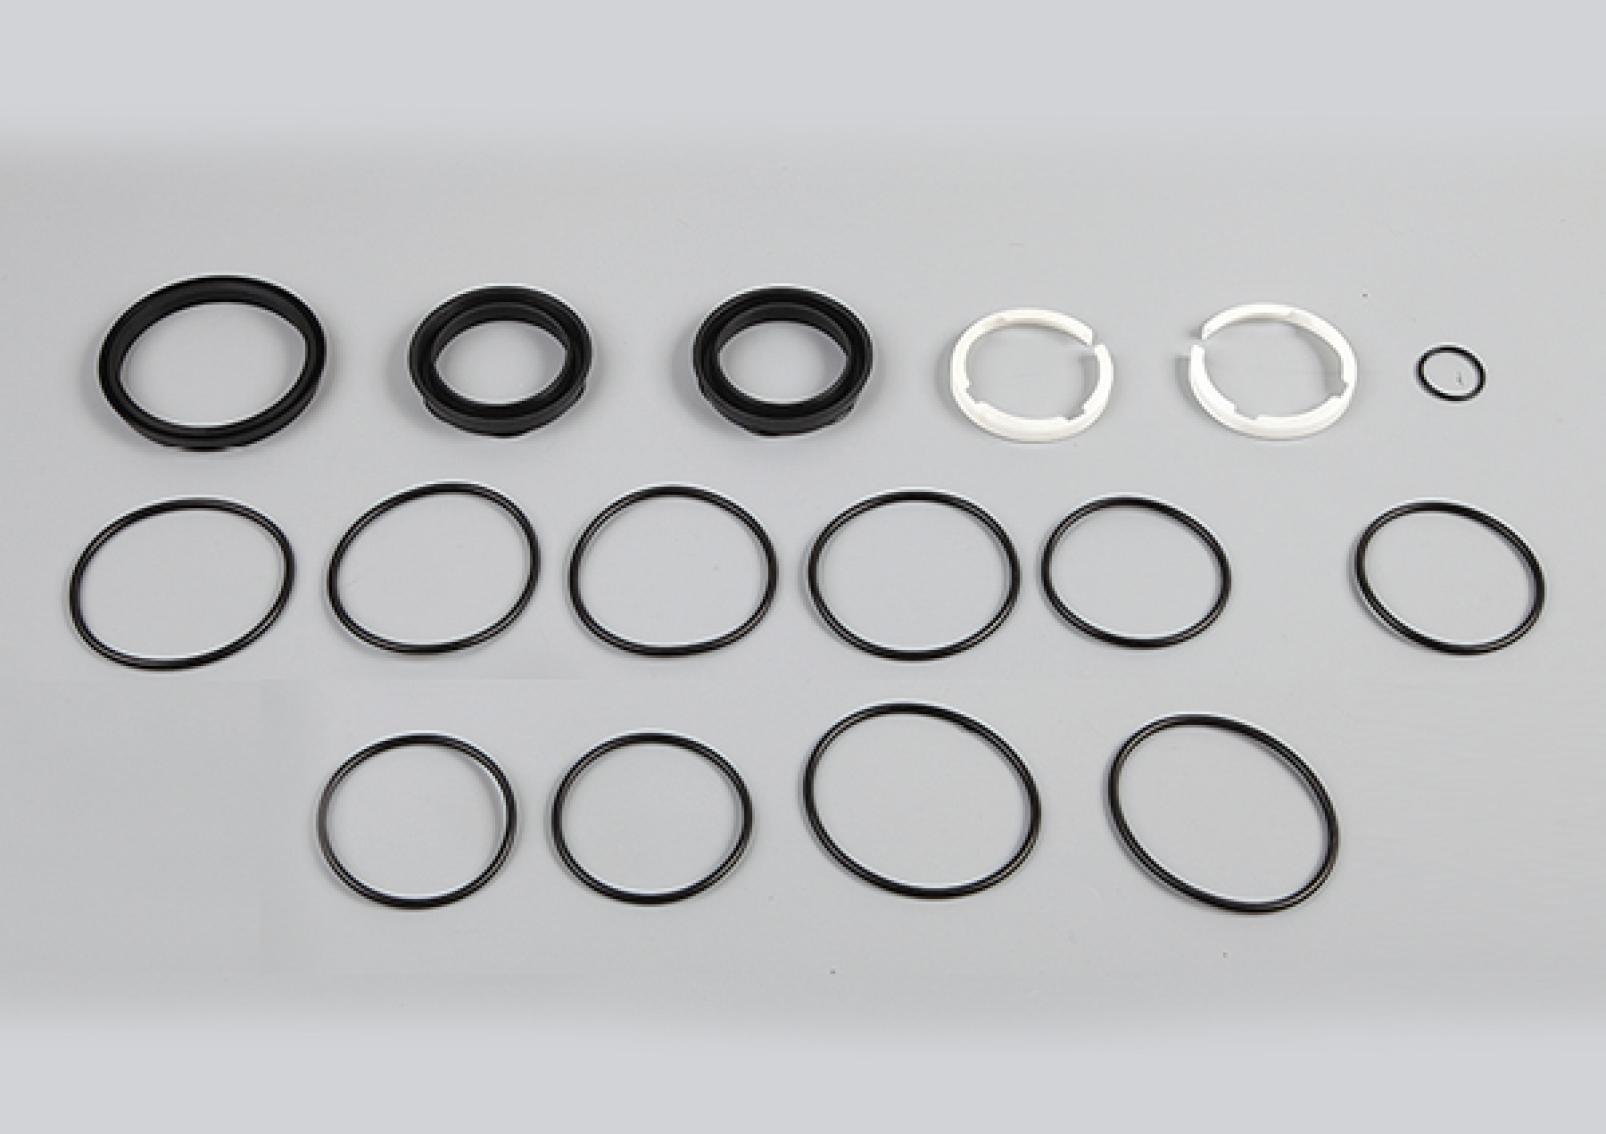 Ebs Park Release Valve Repair Kit, 971 002 900 0